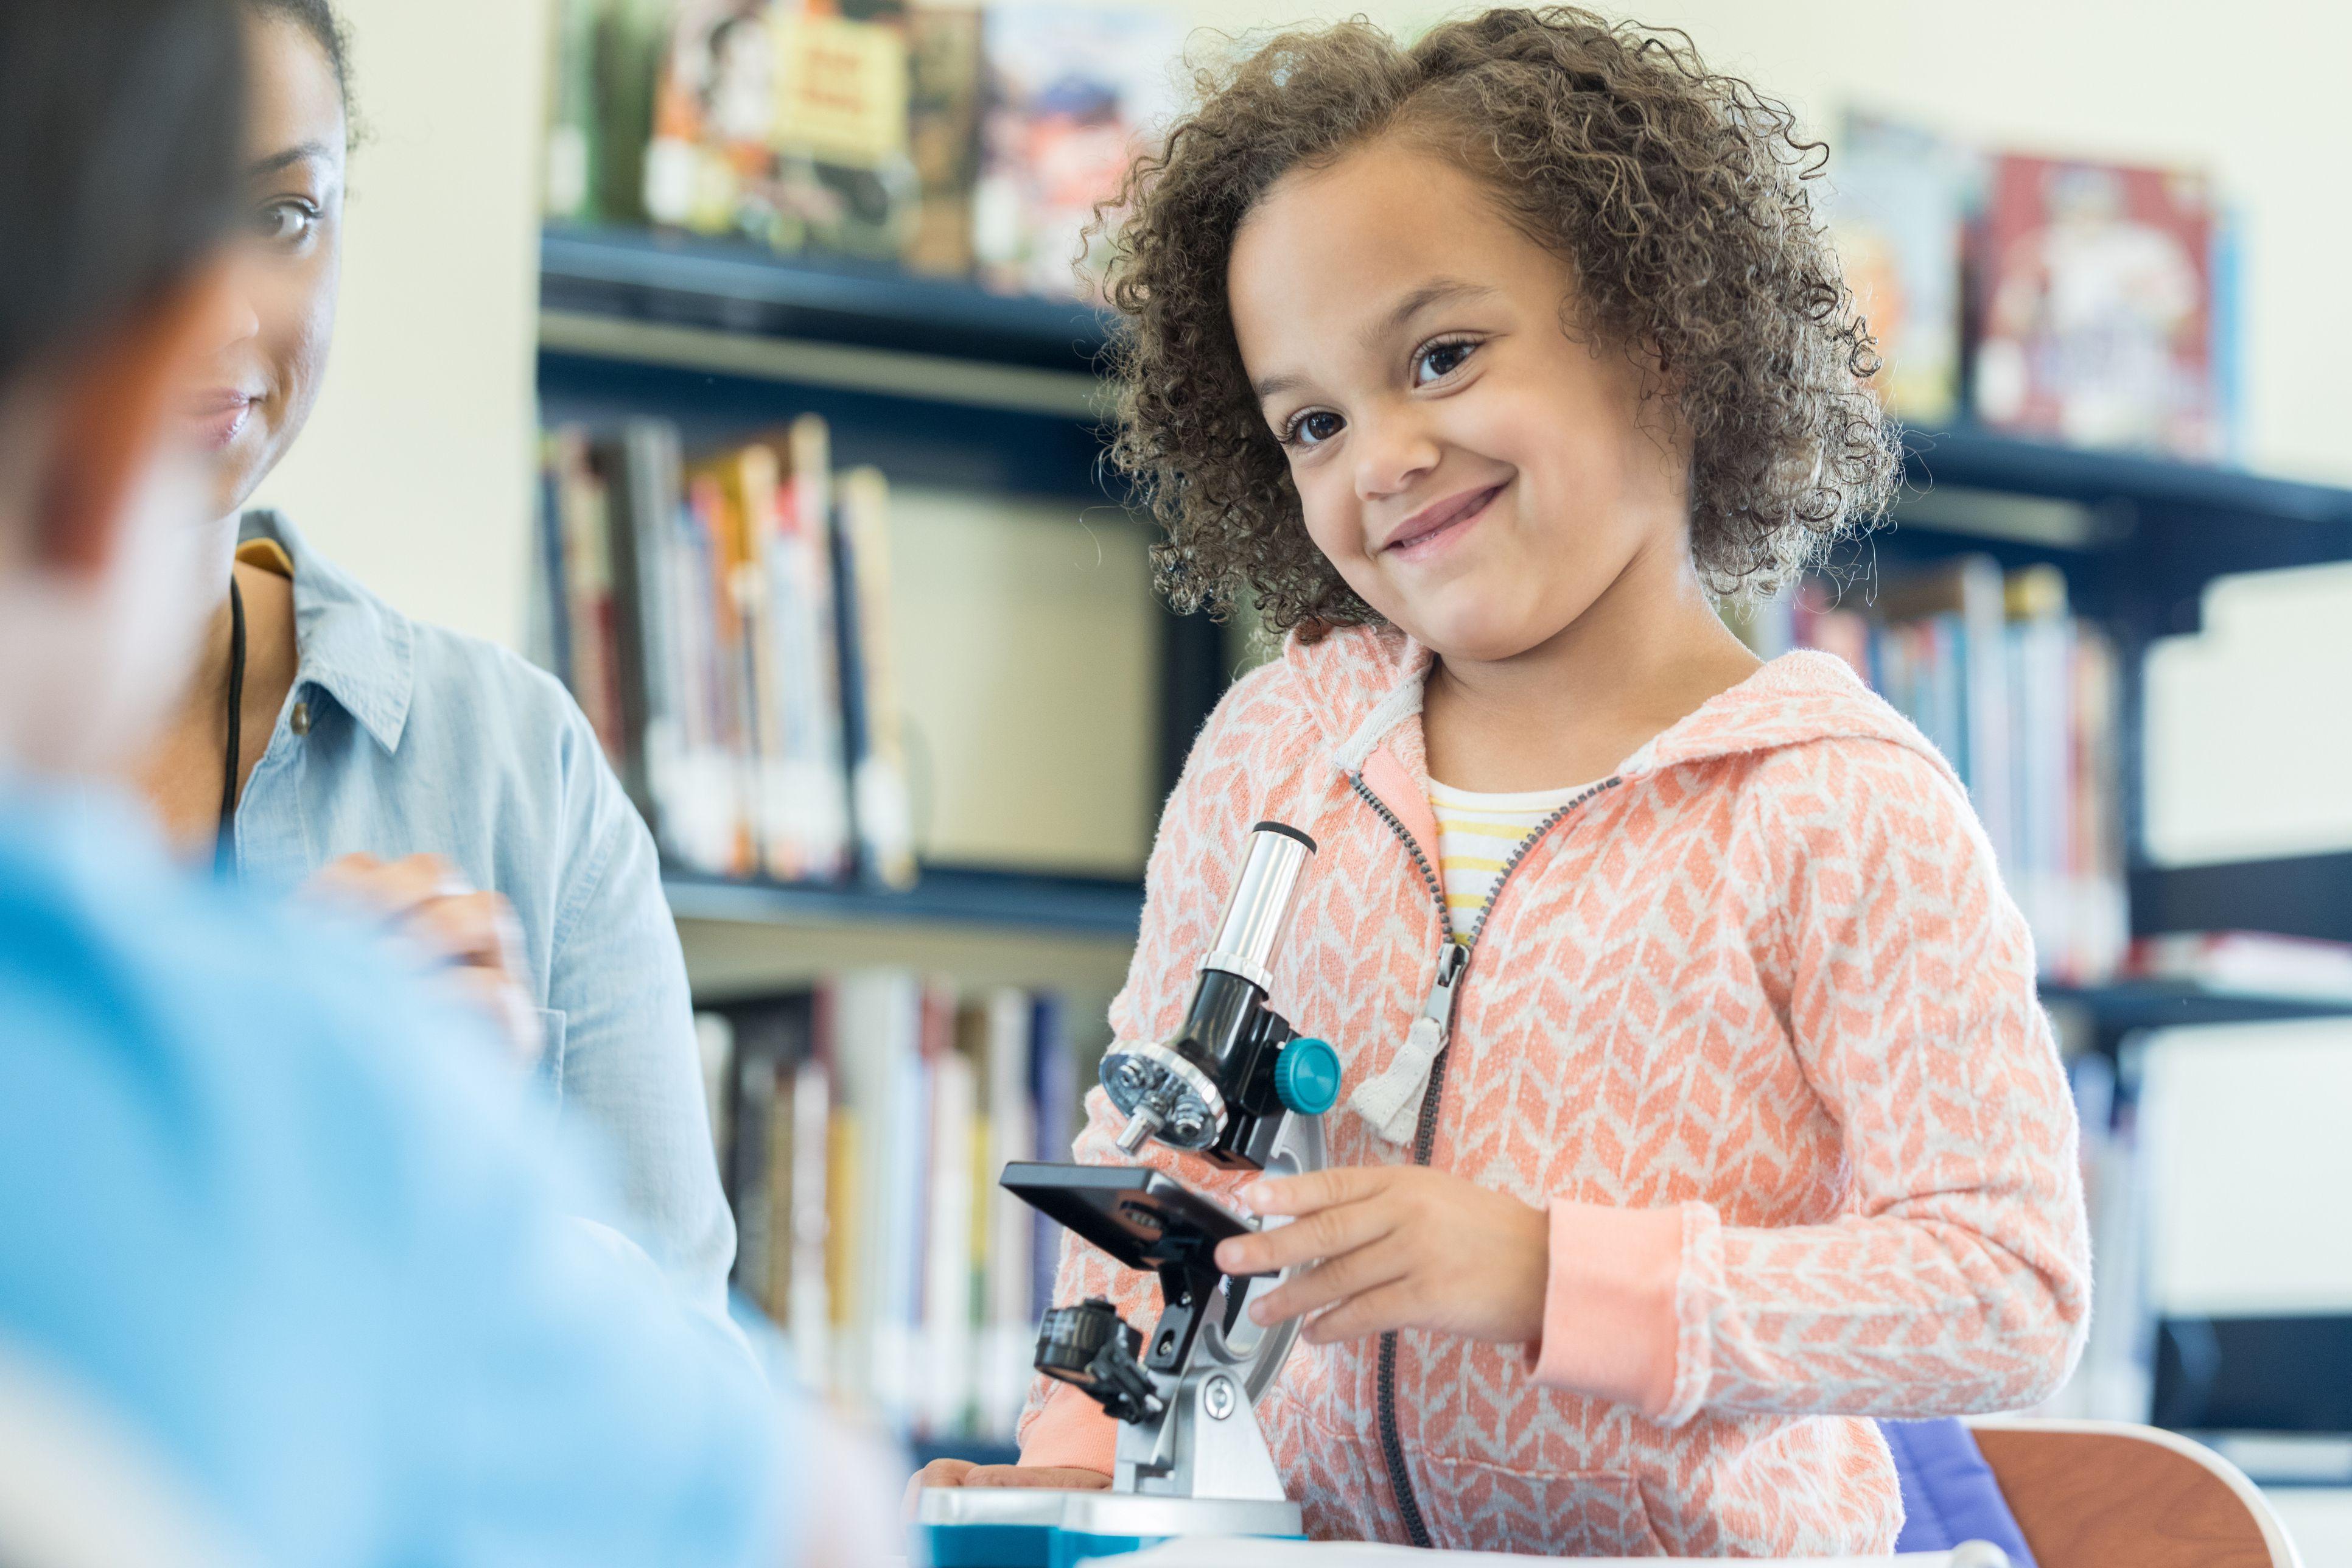 Adorable little girl using microscope